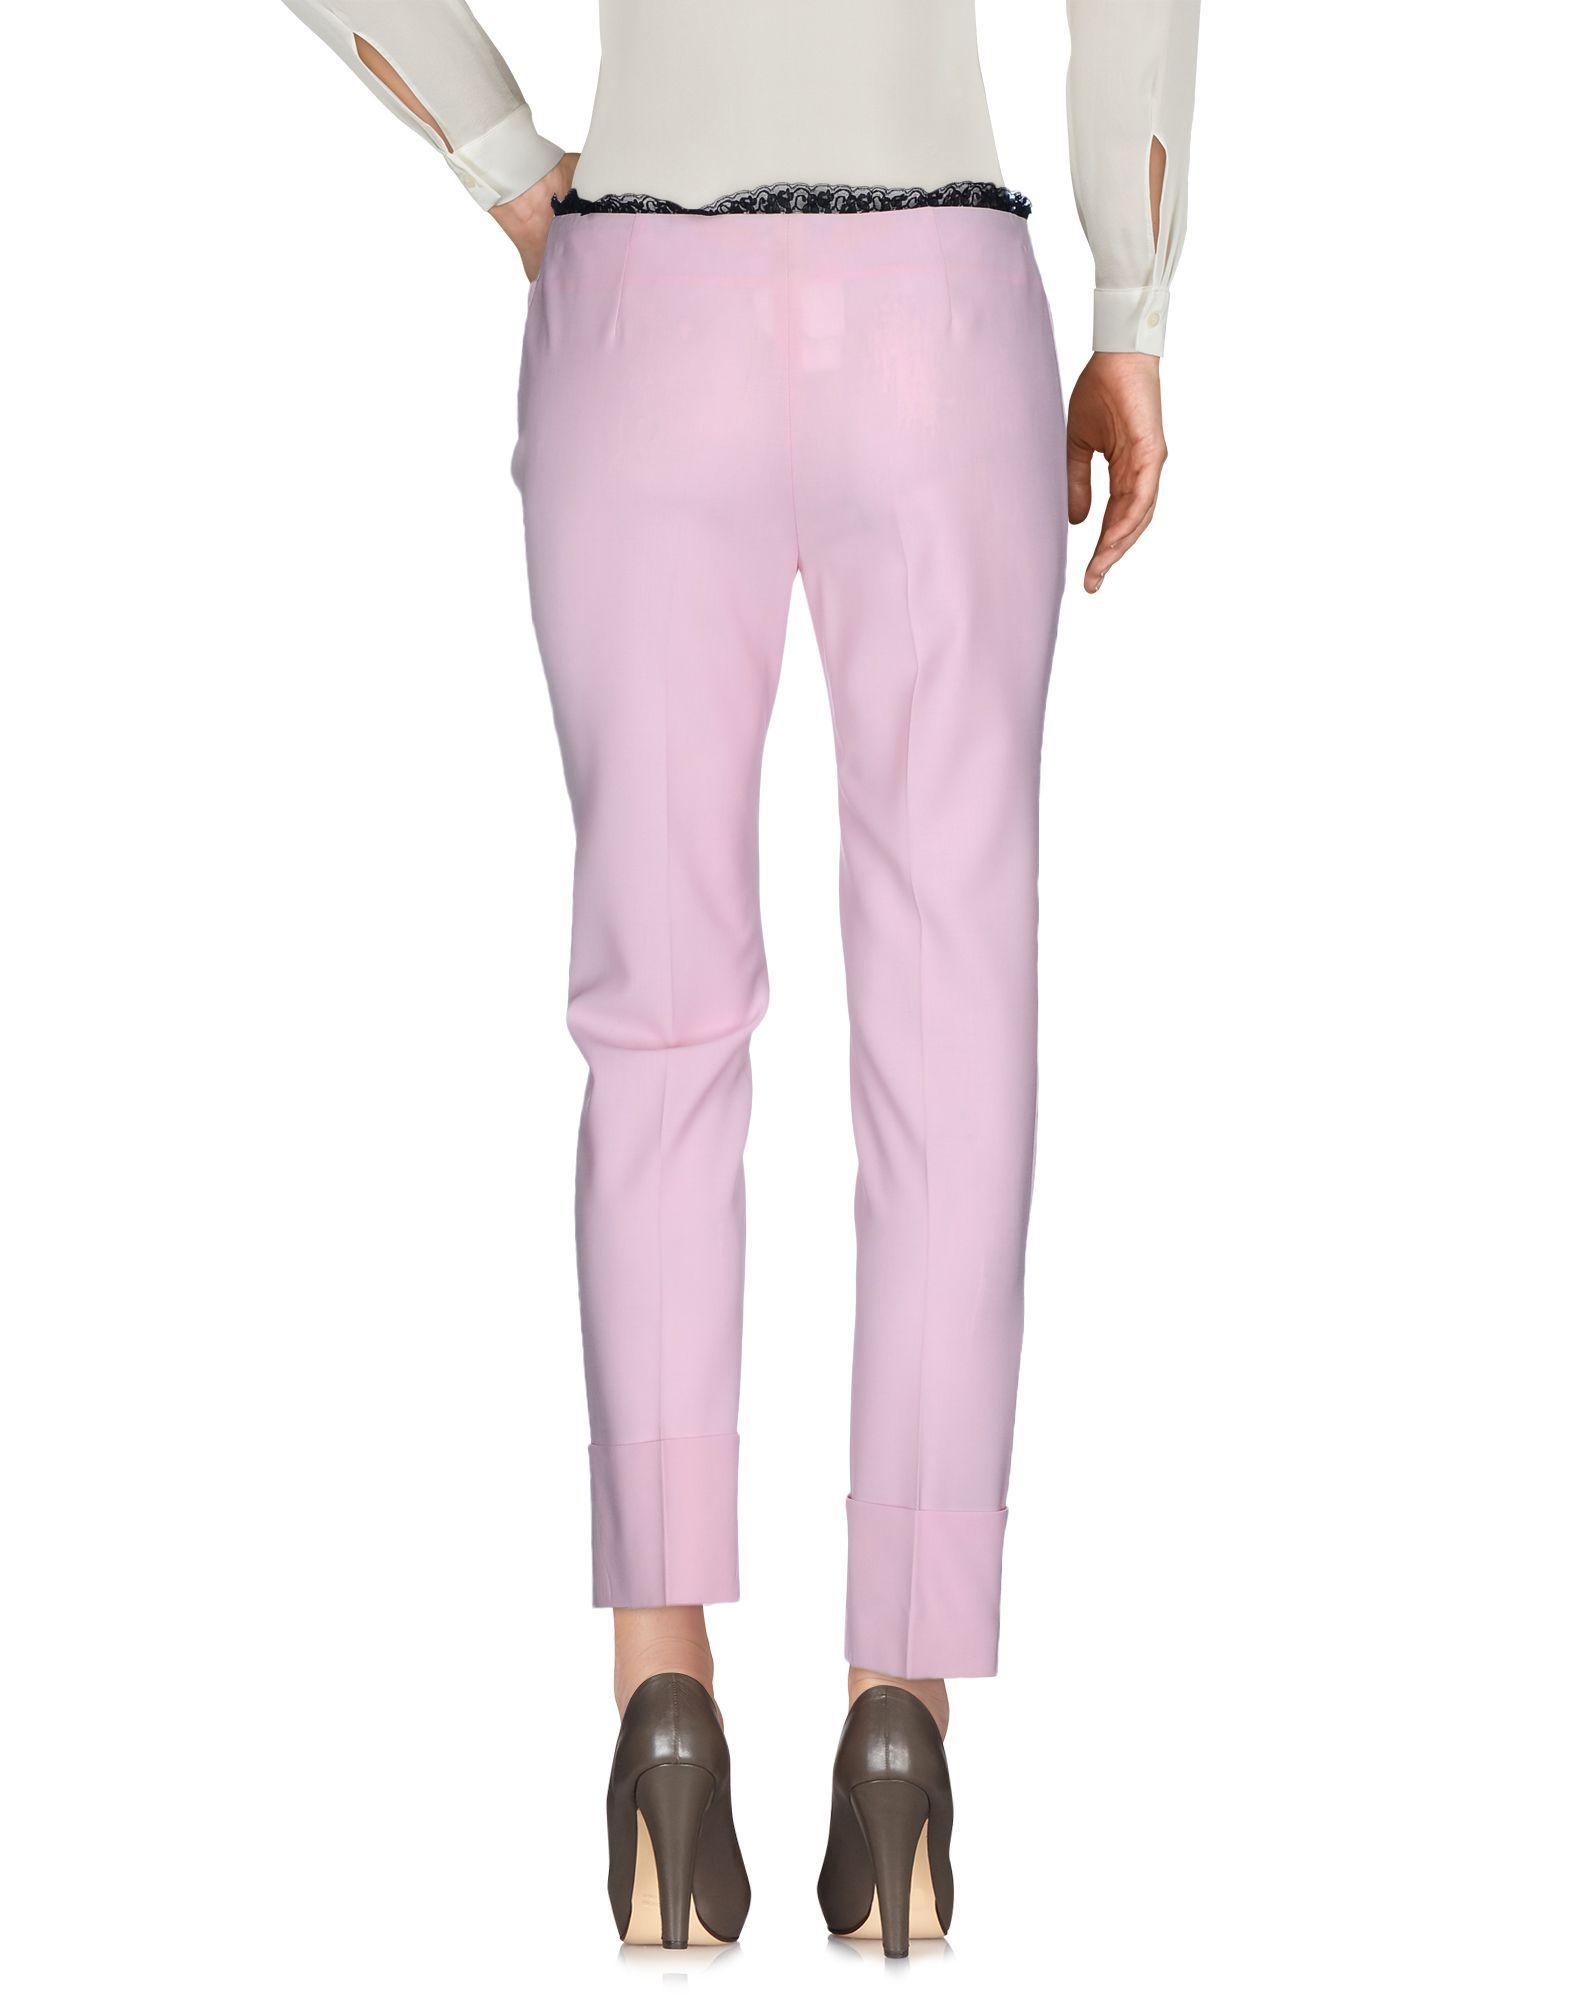 John Richmond Pink Virgin Wool Trousers